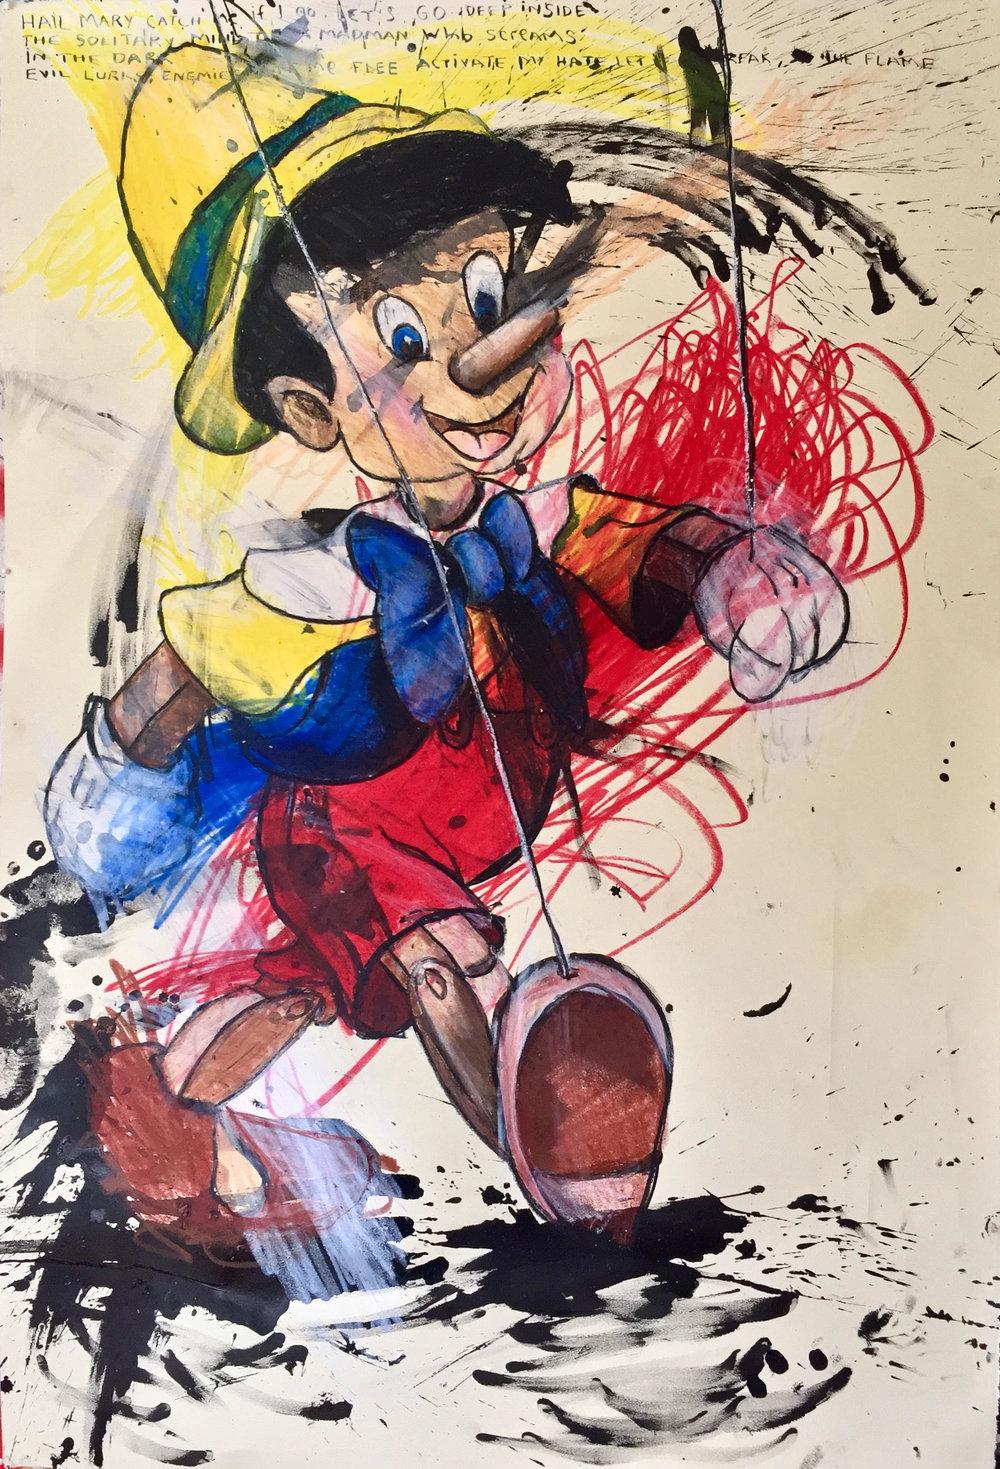 "Dana Louise Kirkpatrick, Change Keep A-Comin' ""La la-da-la la la la la"" , 2017, Sumi ink and Crayola crayon on Arches cotton paper, 30 x 44 in. (76 x 111cm) © Dana Louise Kirkpatrick."